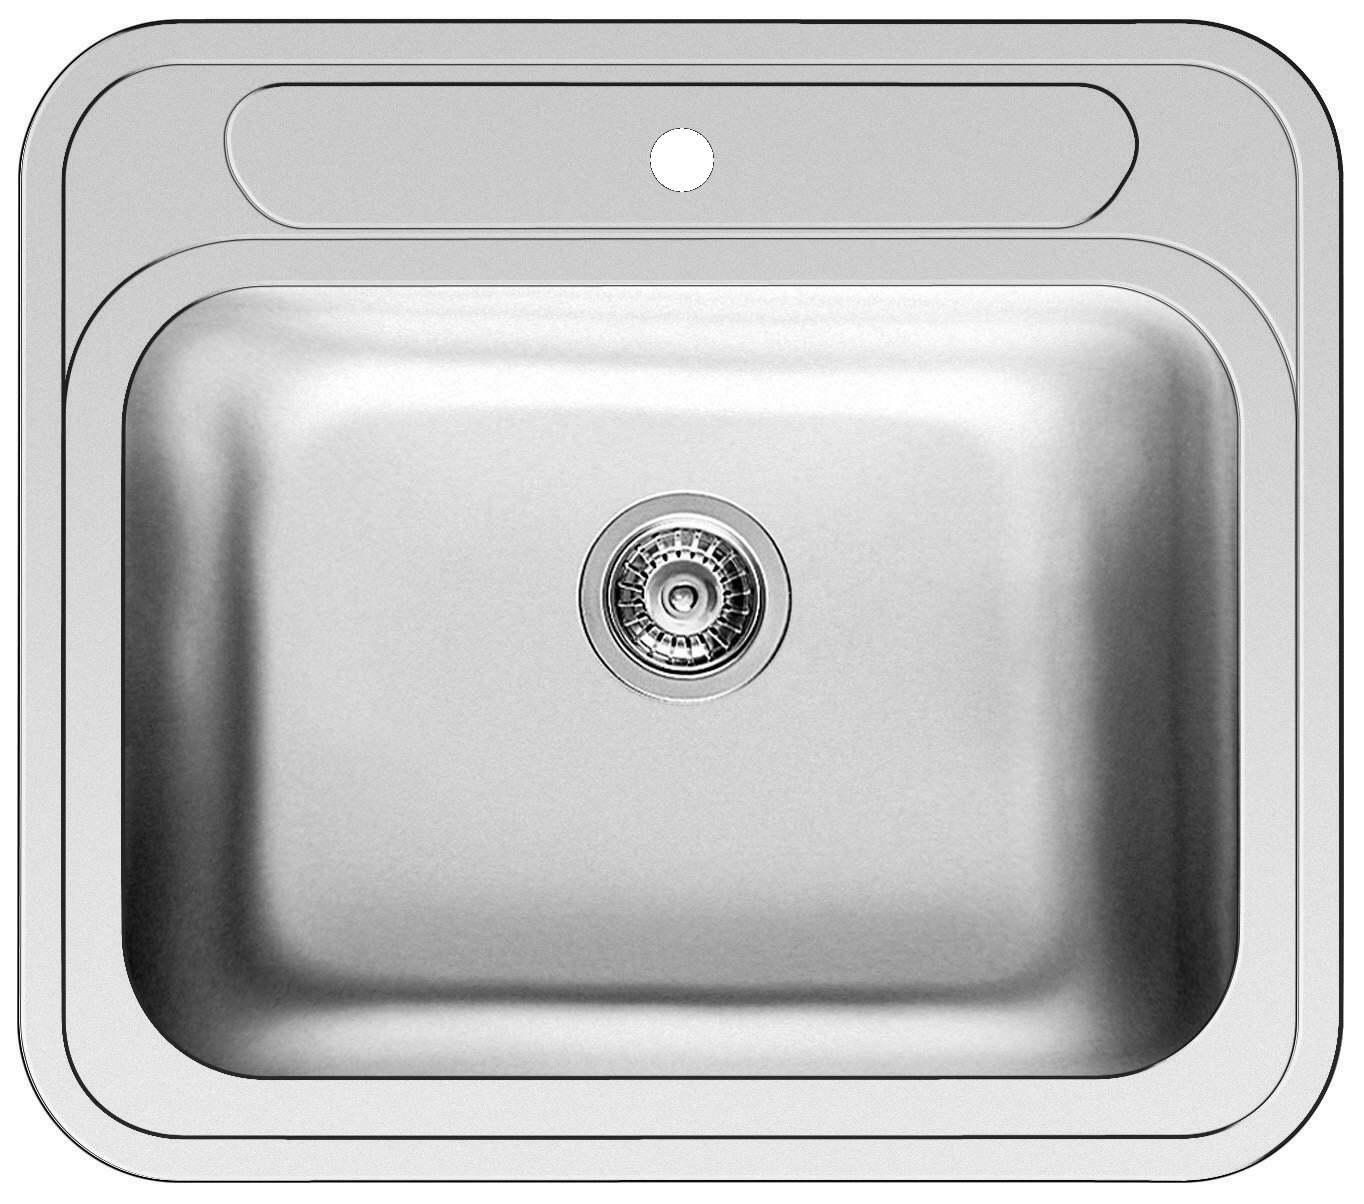 Pyramis ATRIA Einbauspüle Becken Edelstahl-Spüle poliert 575 x 505 mm